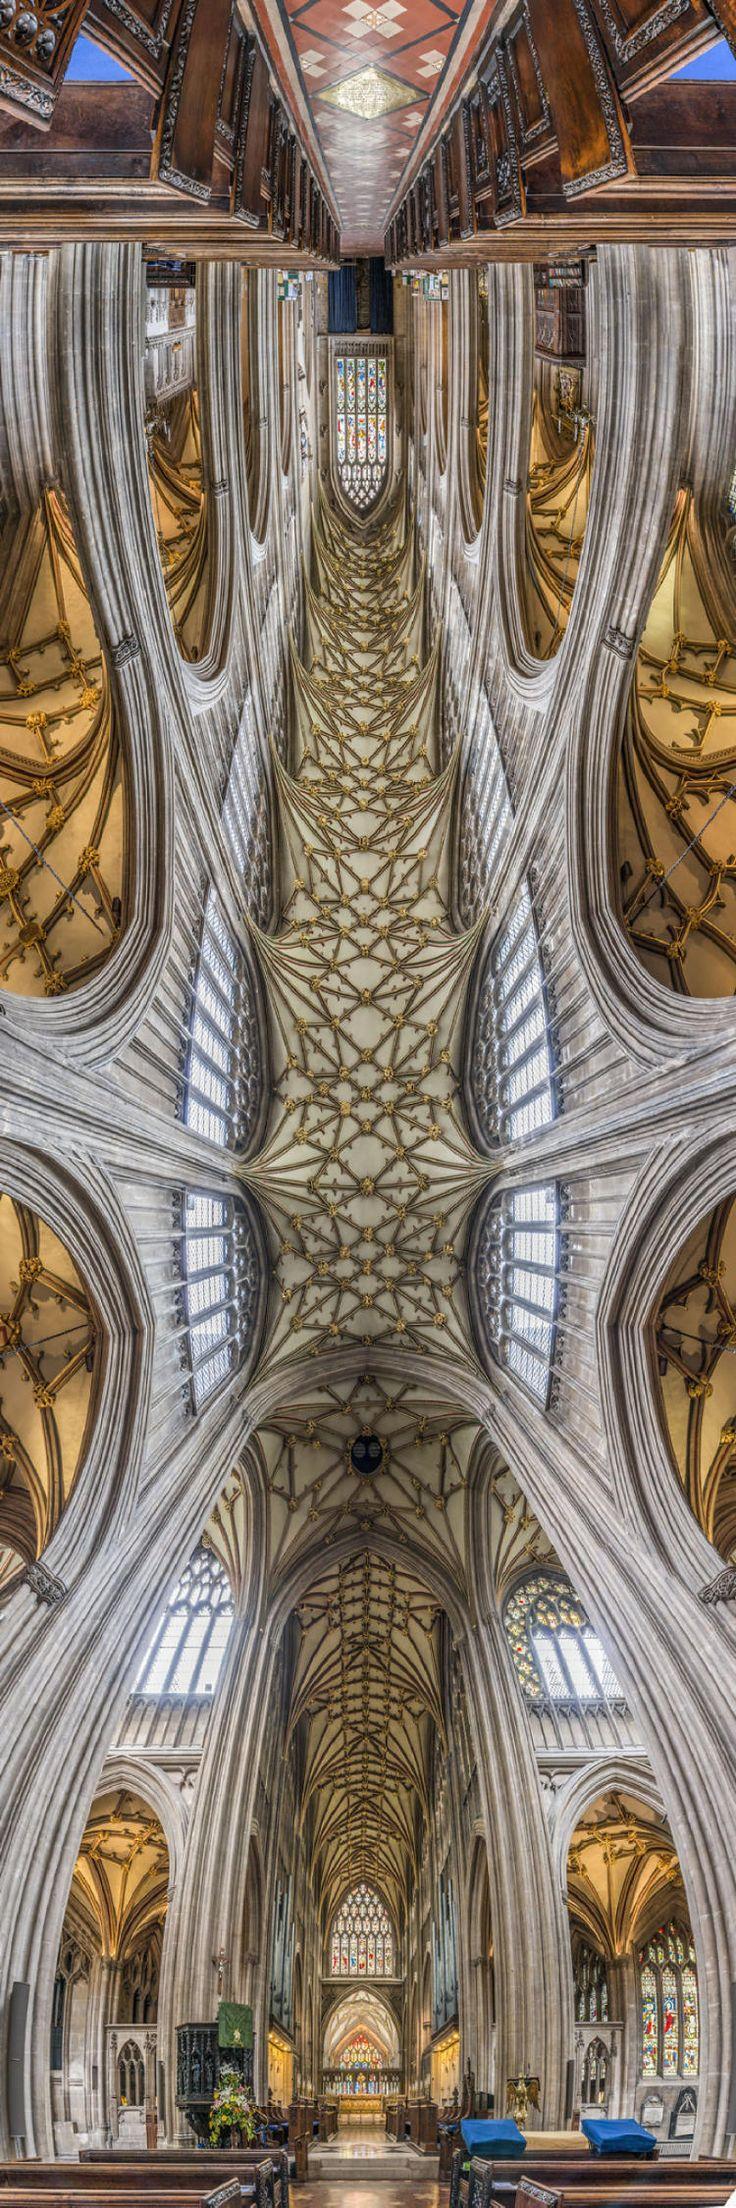 Церковь Сент-Мэри-Редклифф, Бристоль, Англия